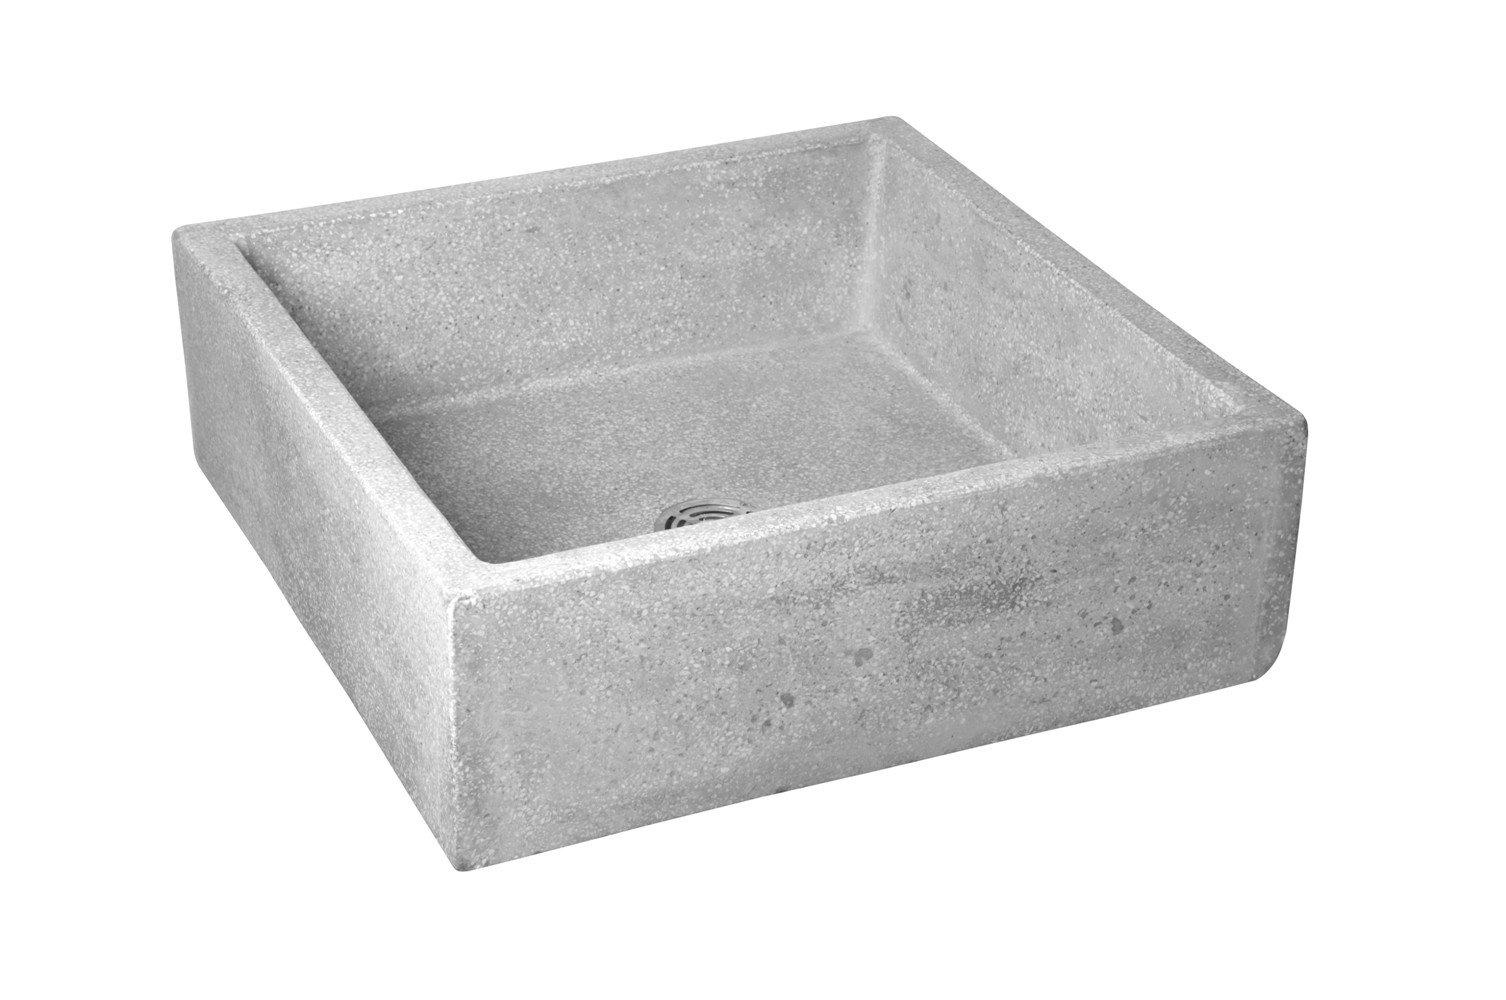 Crane TSB600501 White Marble/White Cement Commercial Plain Curbs Mop Service Basin TSB600